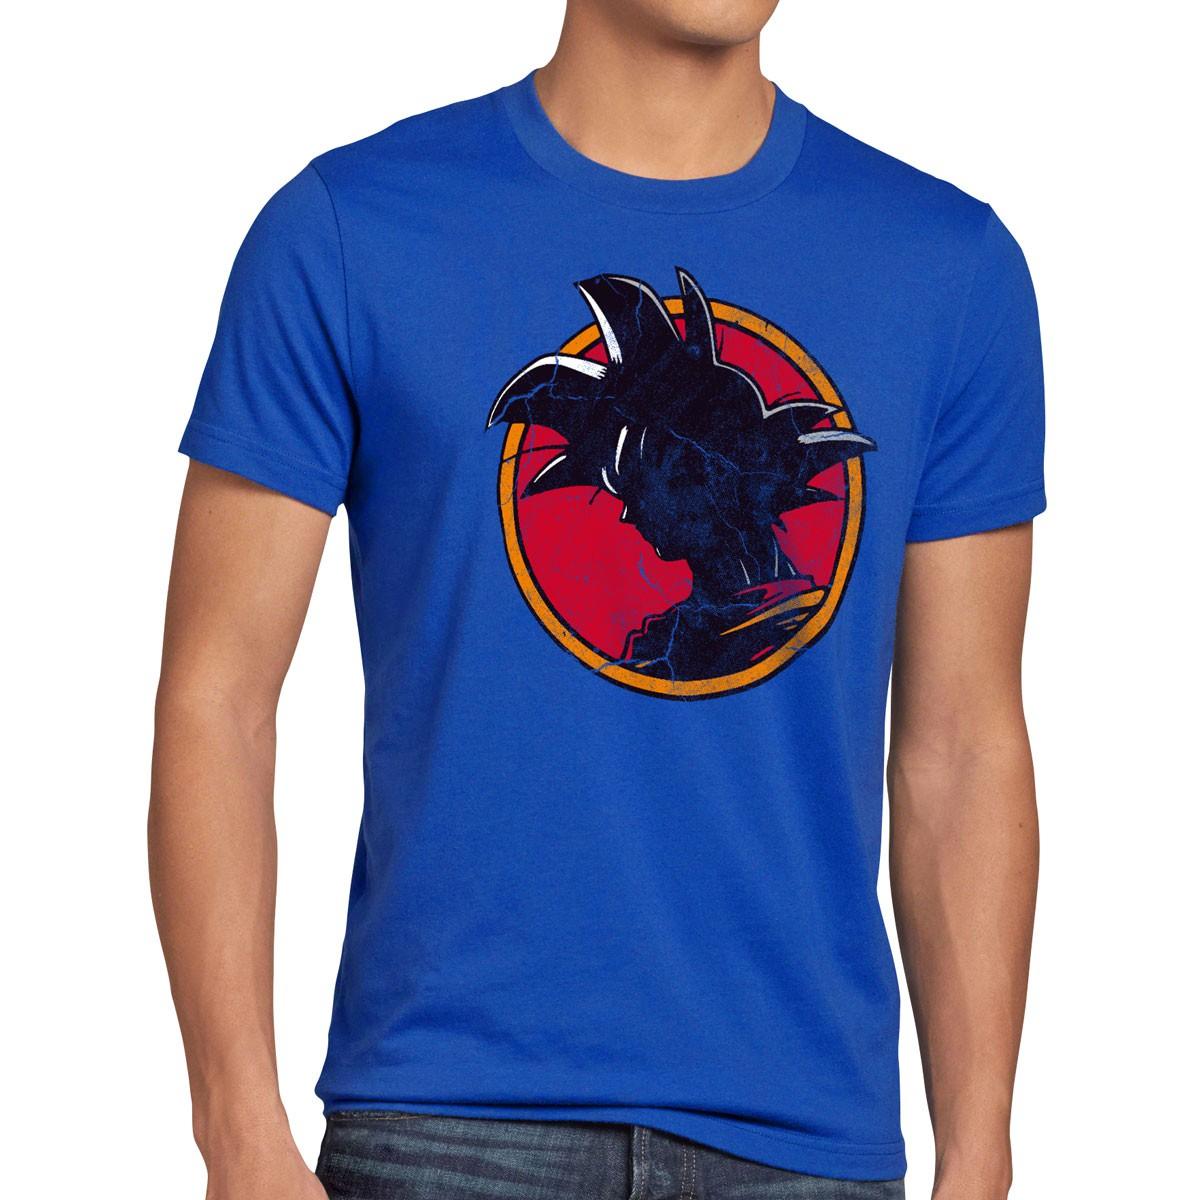 dragonball z dad shirt